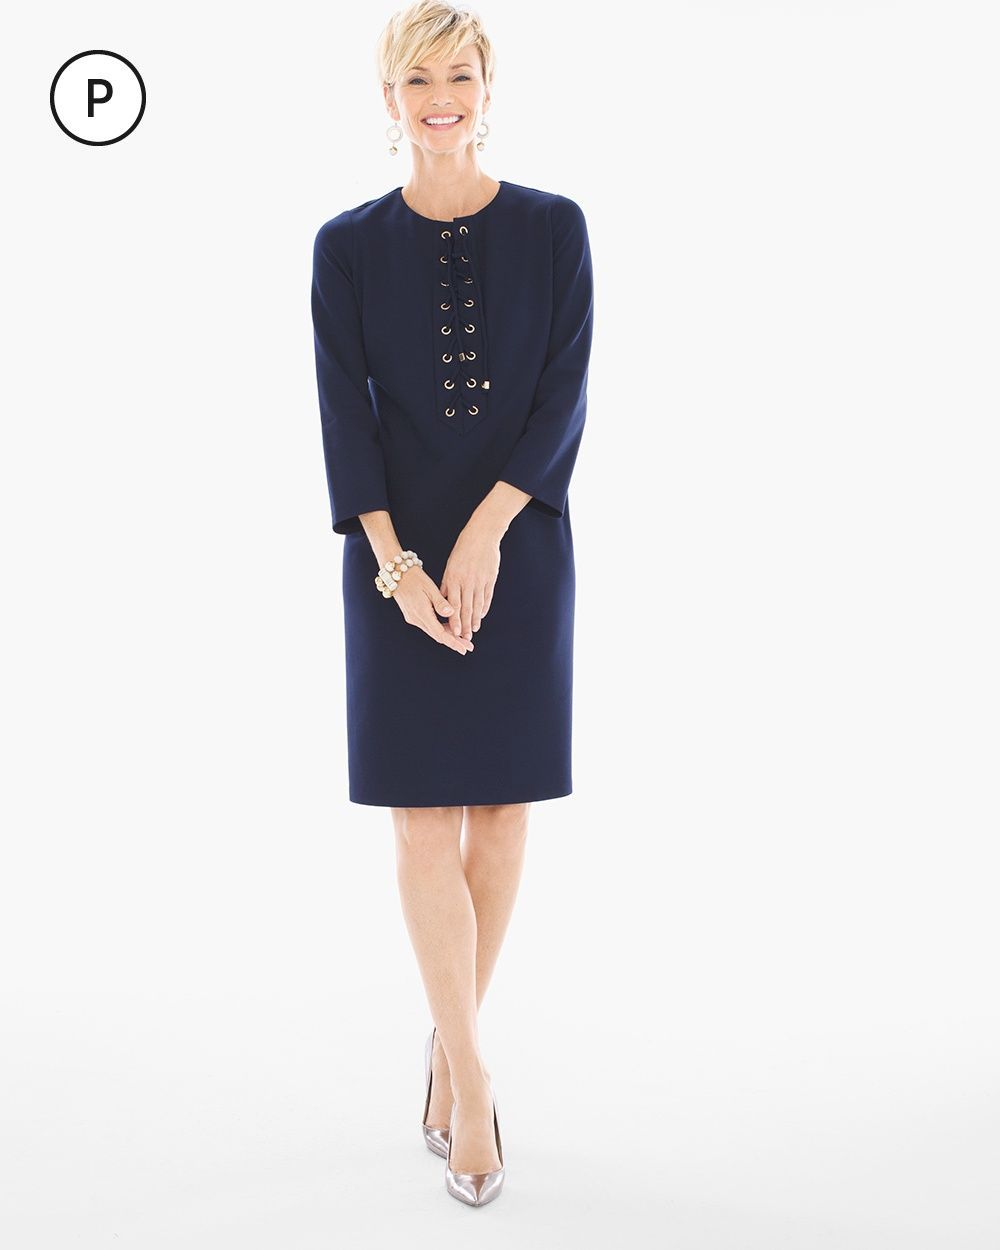 Chicous womenus petite ponte laceup short dress deep navy size